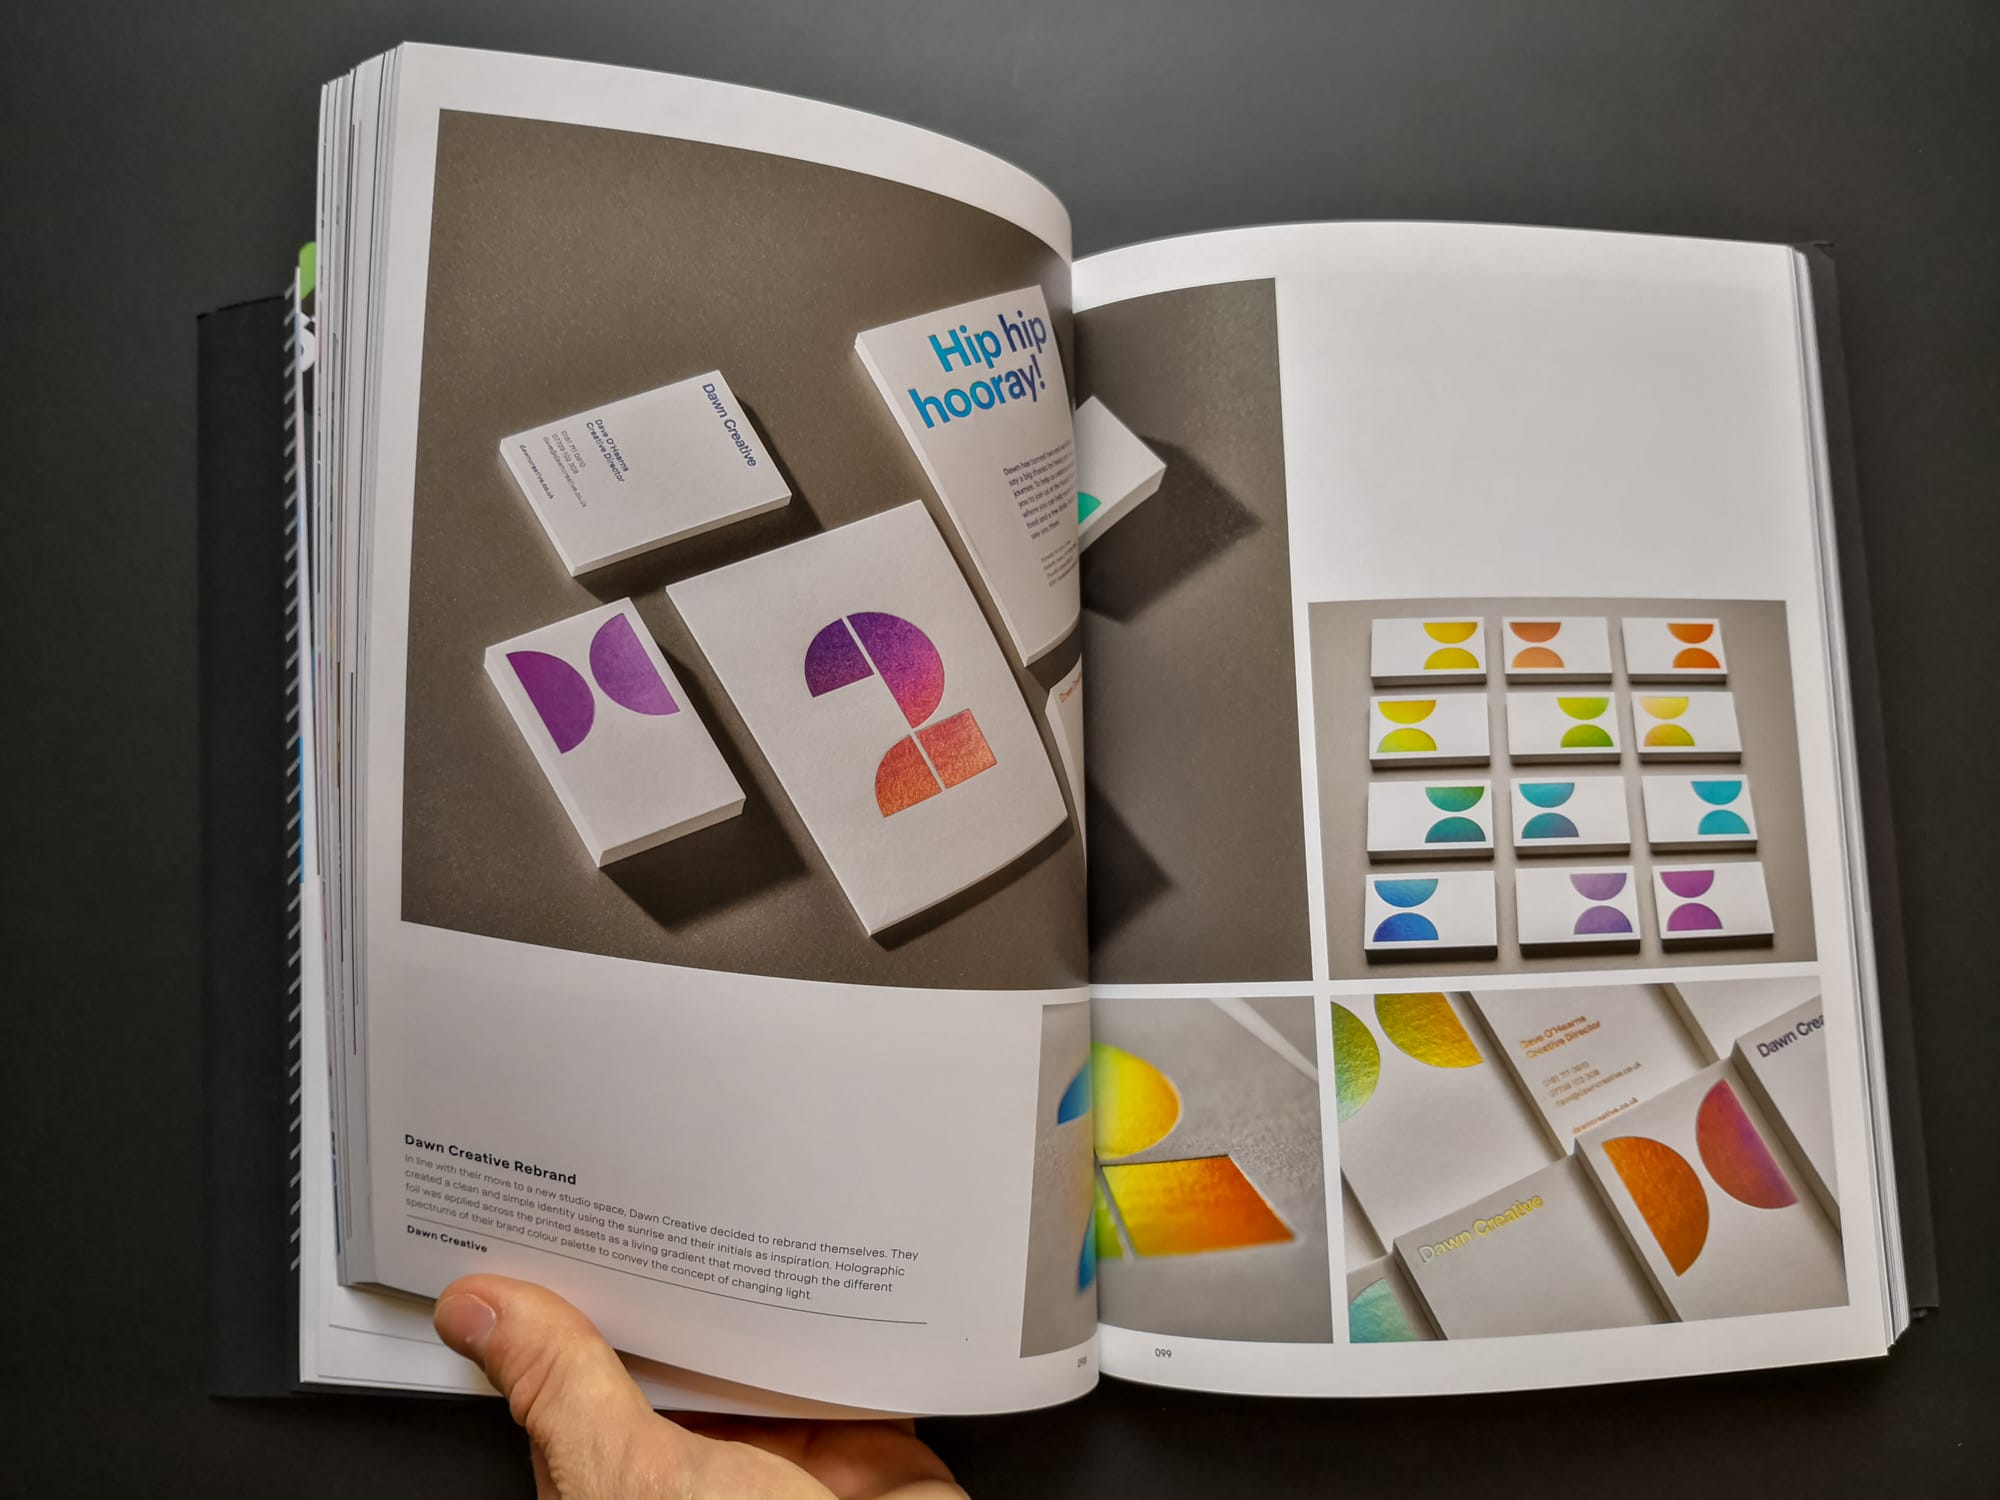 Palette 08 : Iridescent. Dawn Creative Rebrand